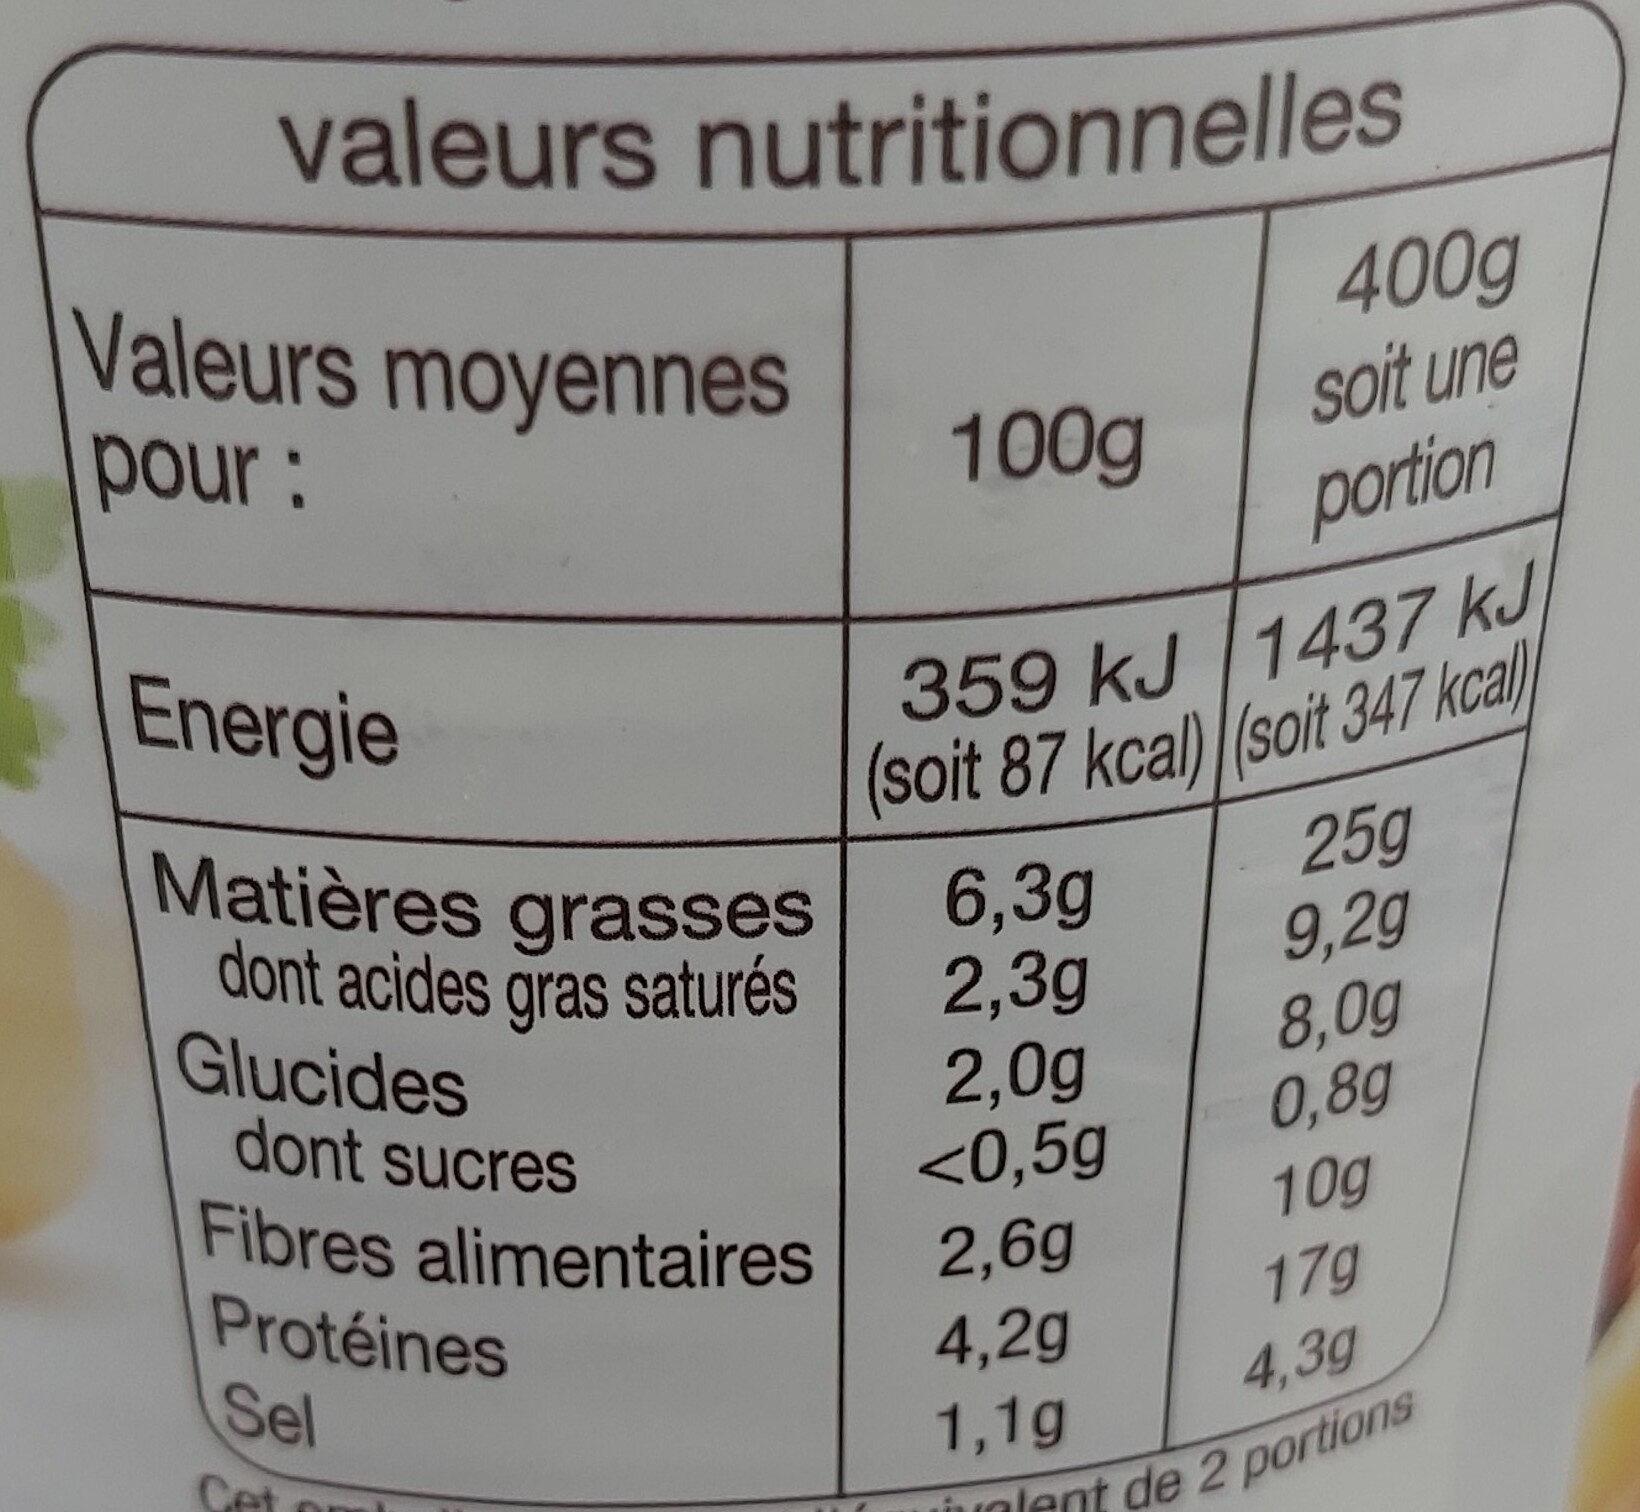 Choucroute garnie au vin blanc - Nutrition facts - fr